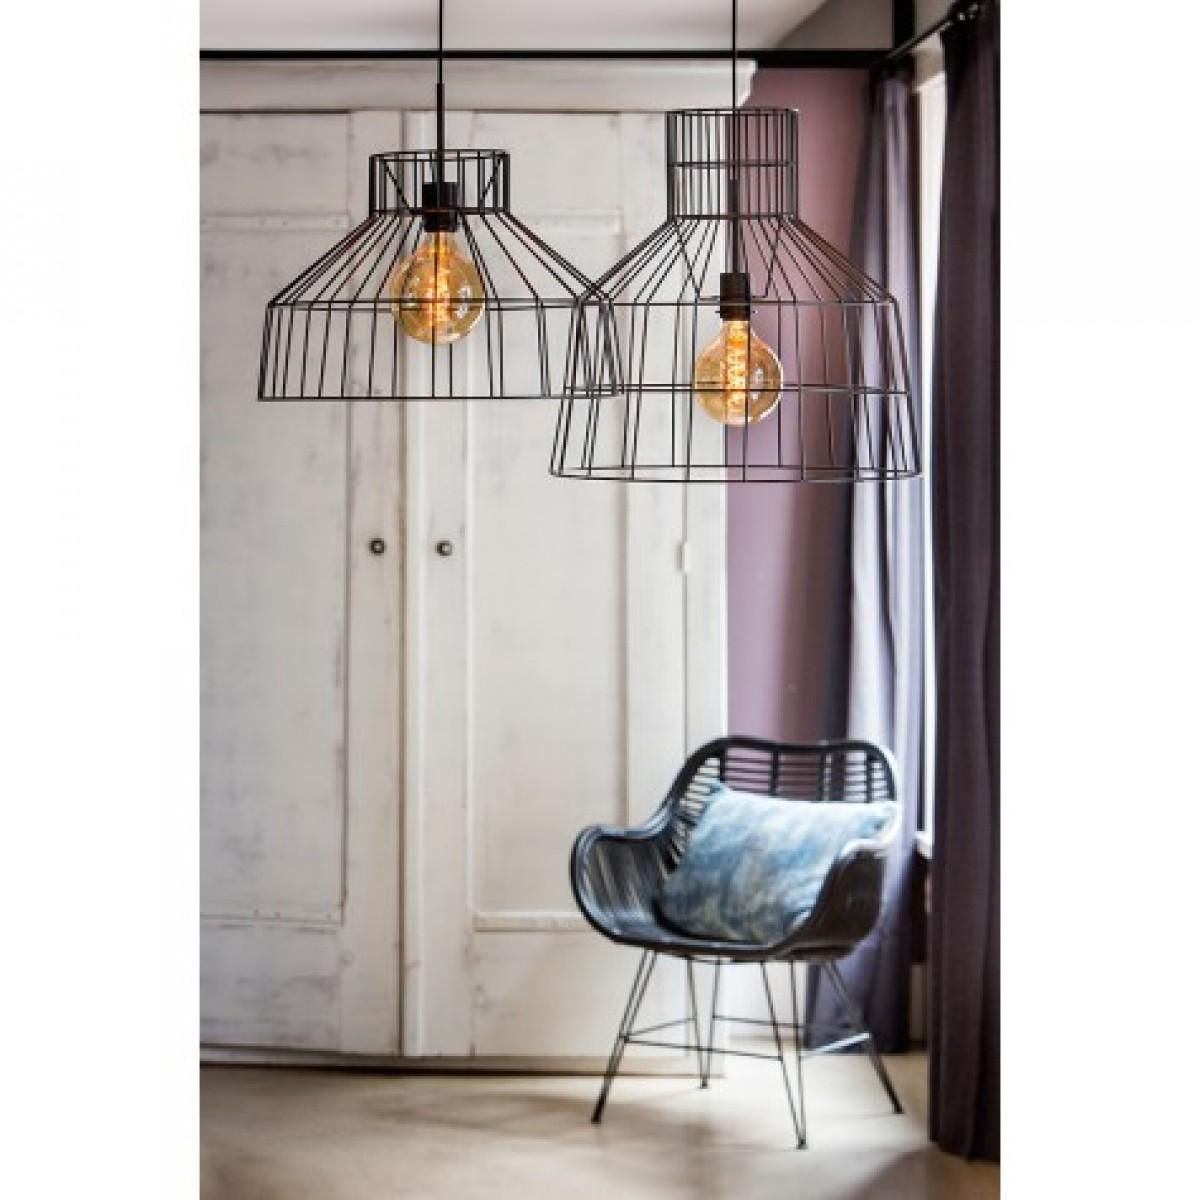 pendelleuchte schwarz metall pendellampe draht metall. Black Bedroom Furniture Sets. Home Design Ideas